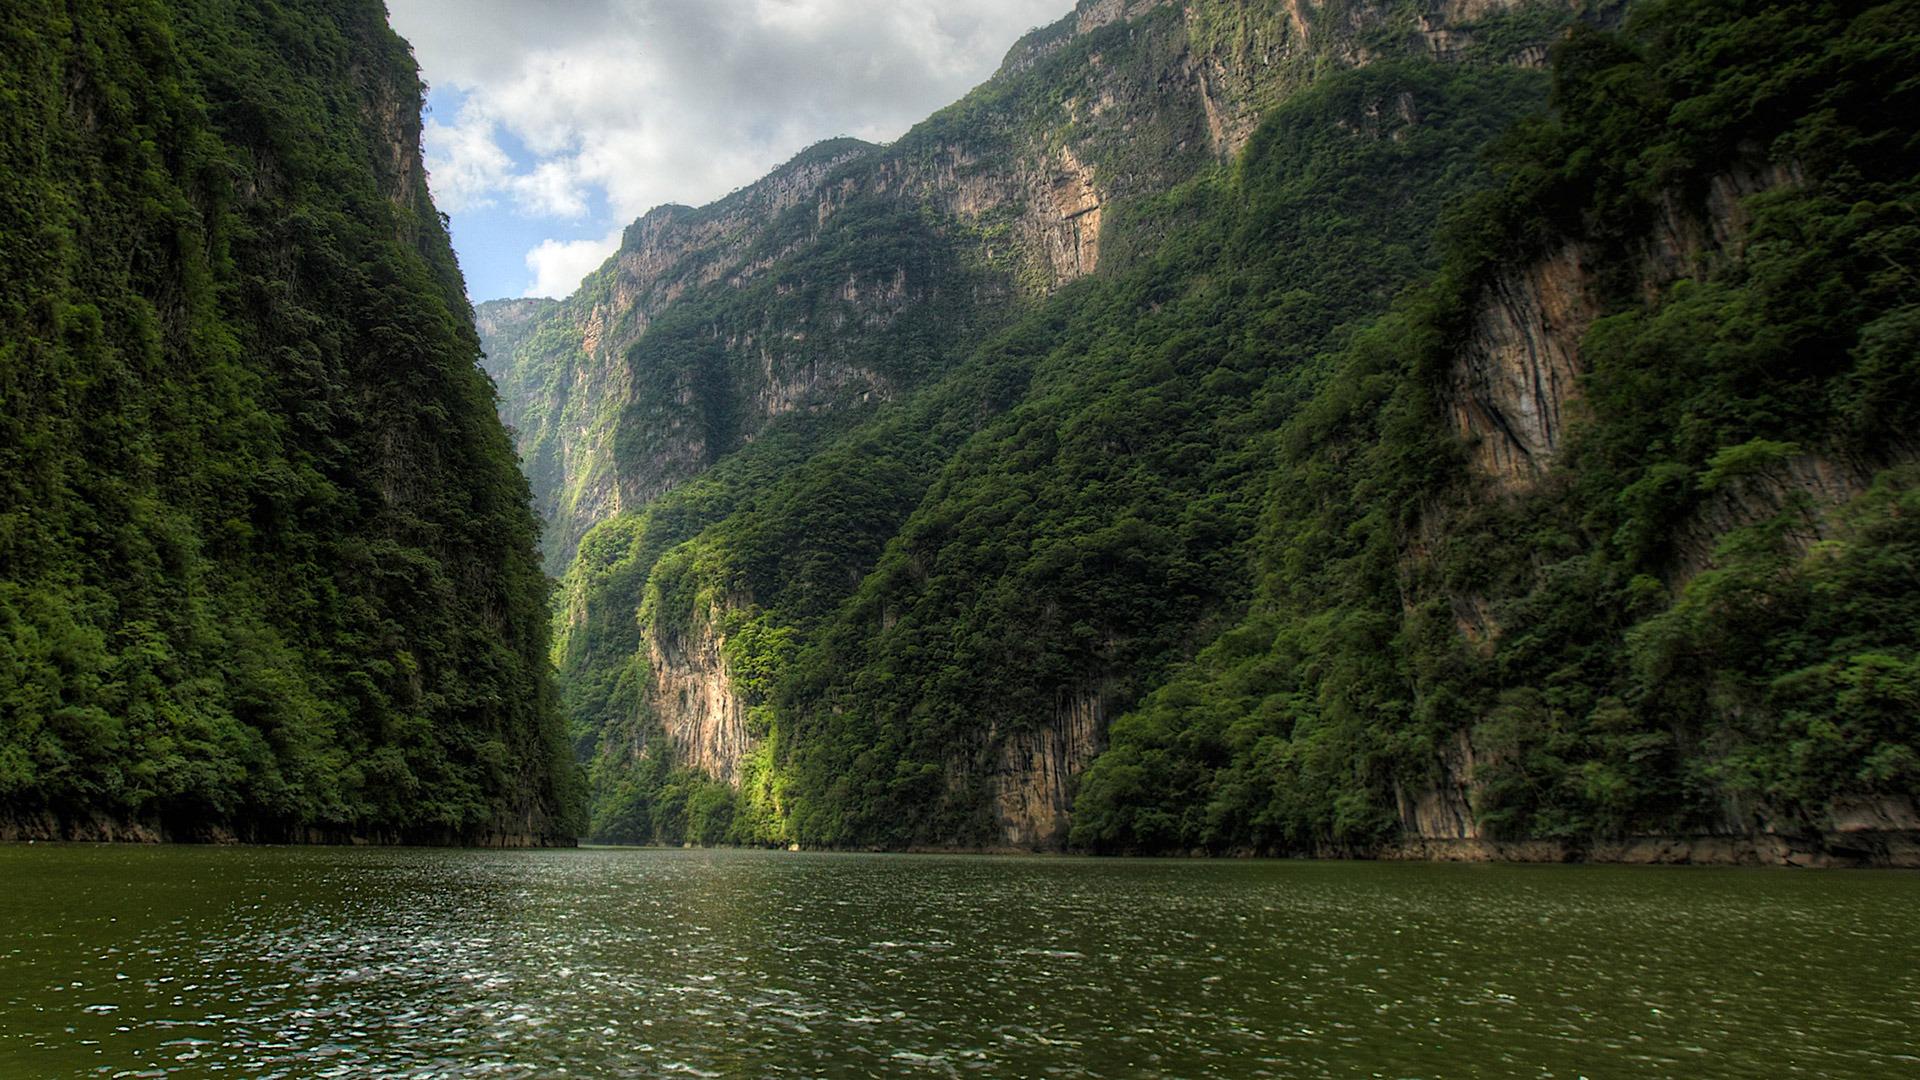 Lush hillsides of Sumidero Canyon in Chiapas, Mexico